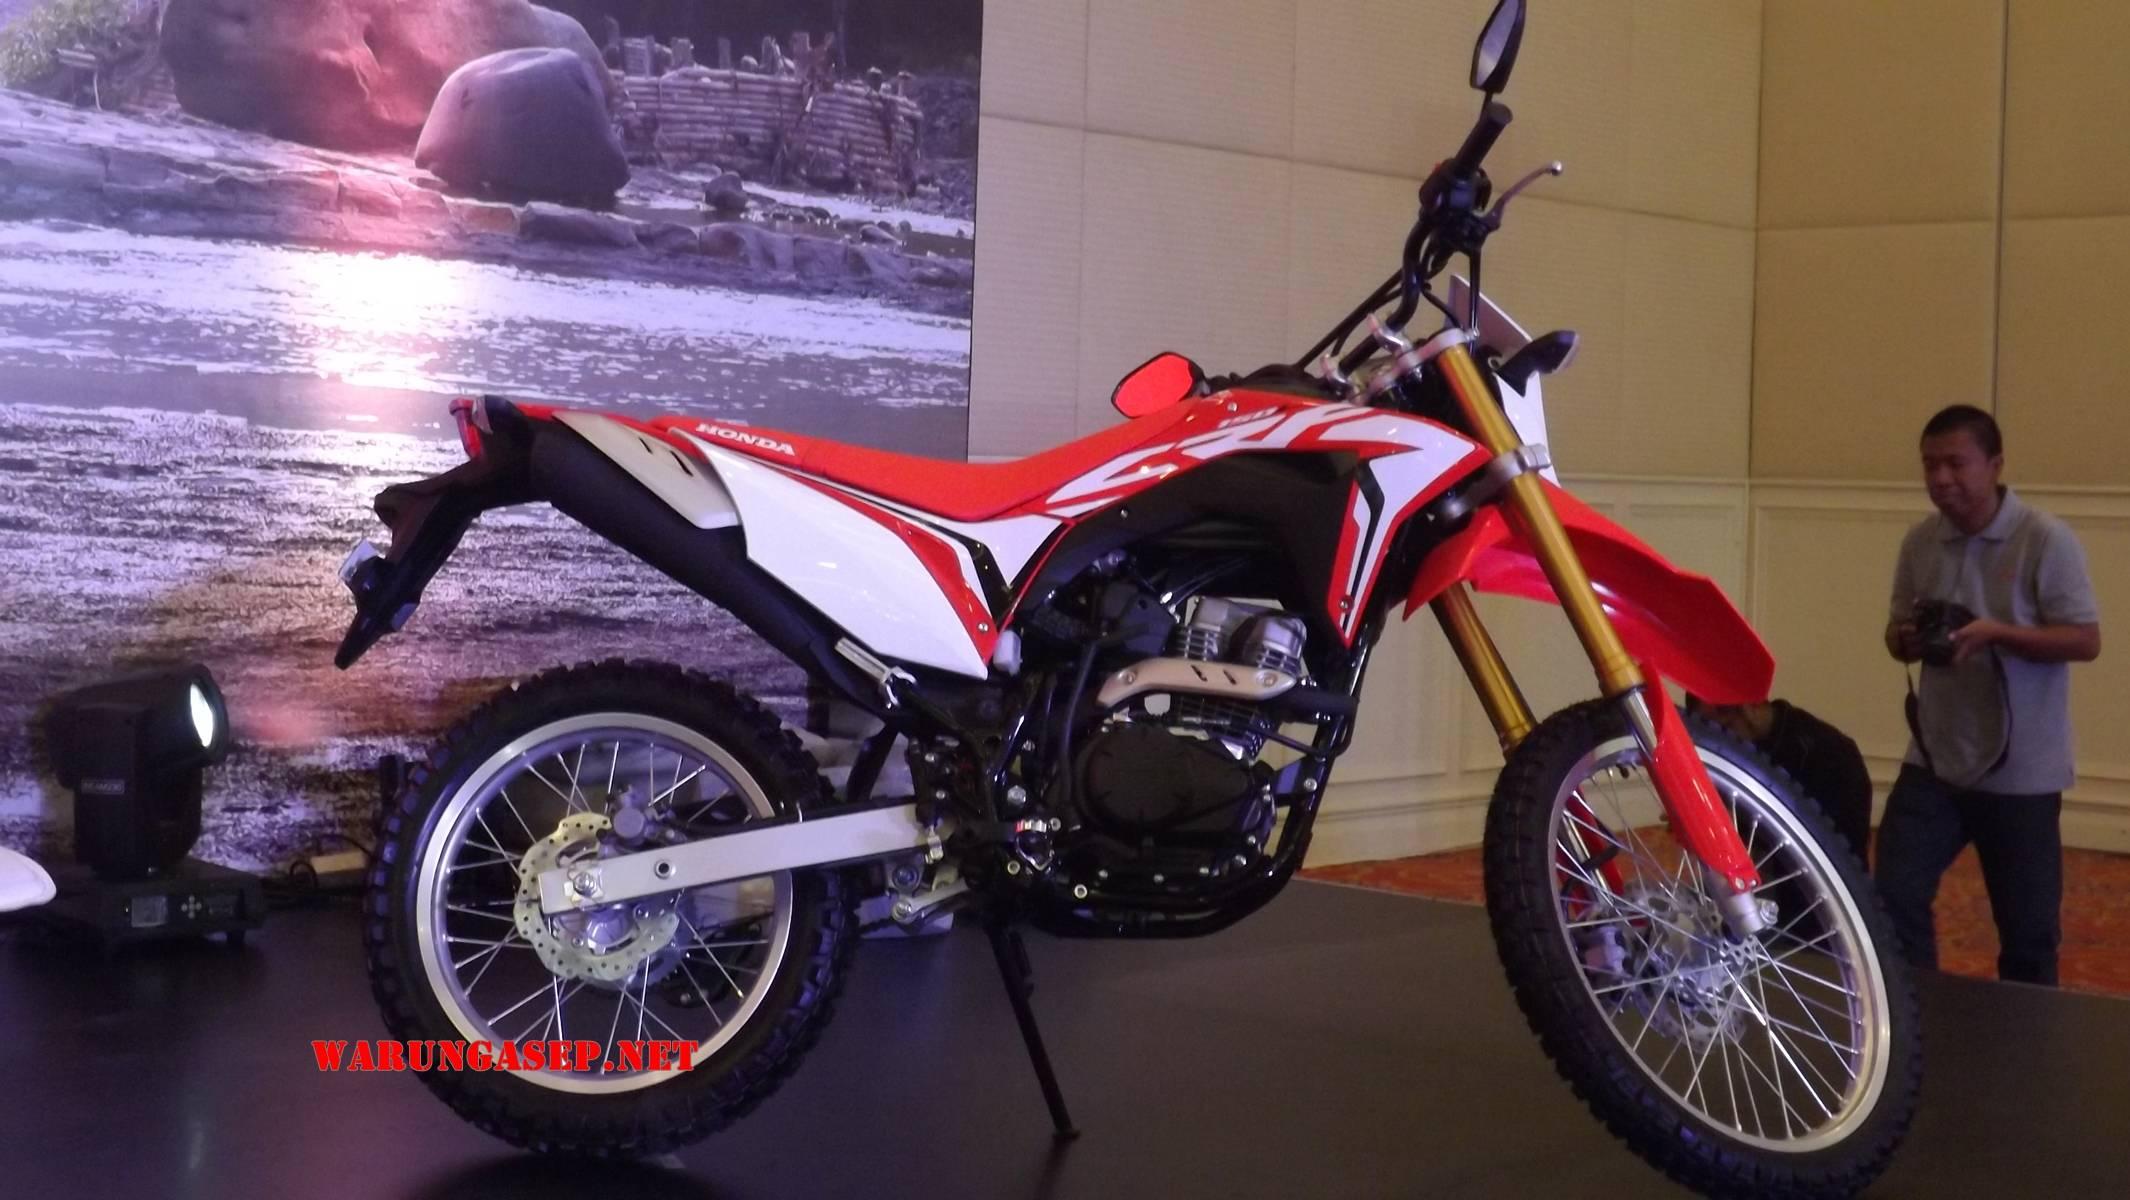 Honda Crf150l 2018 018 Warungasep